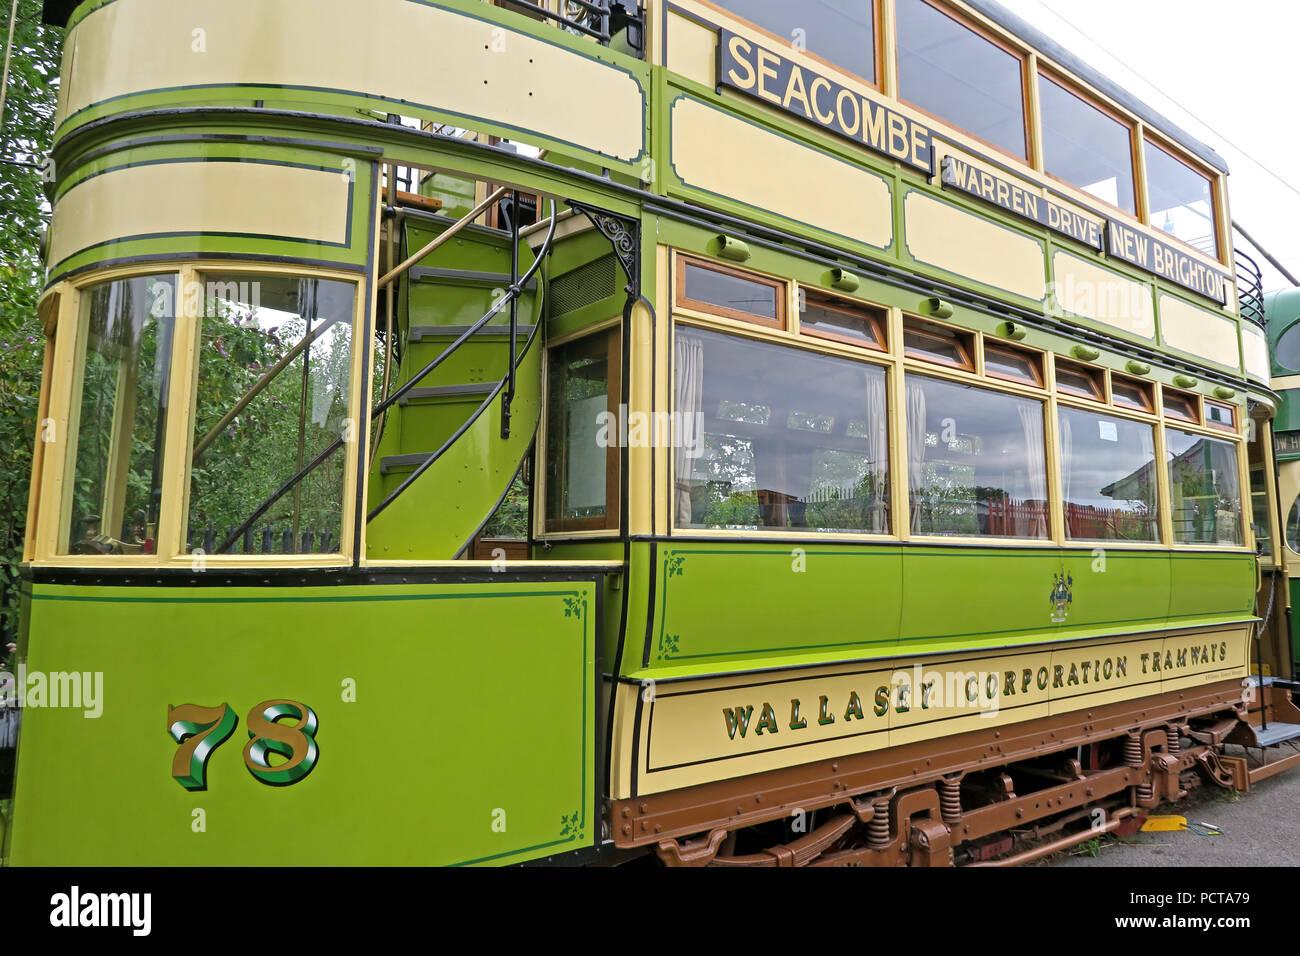 GoTonySmith,@HotpixUK,Transport,tram,trams,Birkenhead,green,cream,creme,north